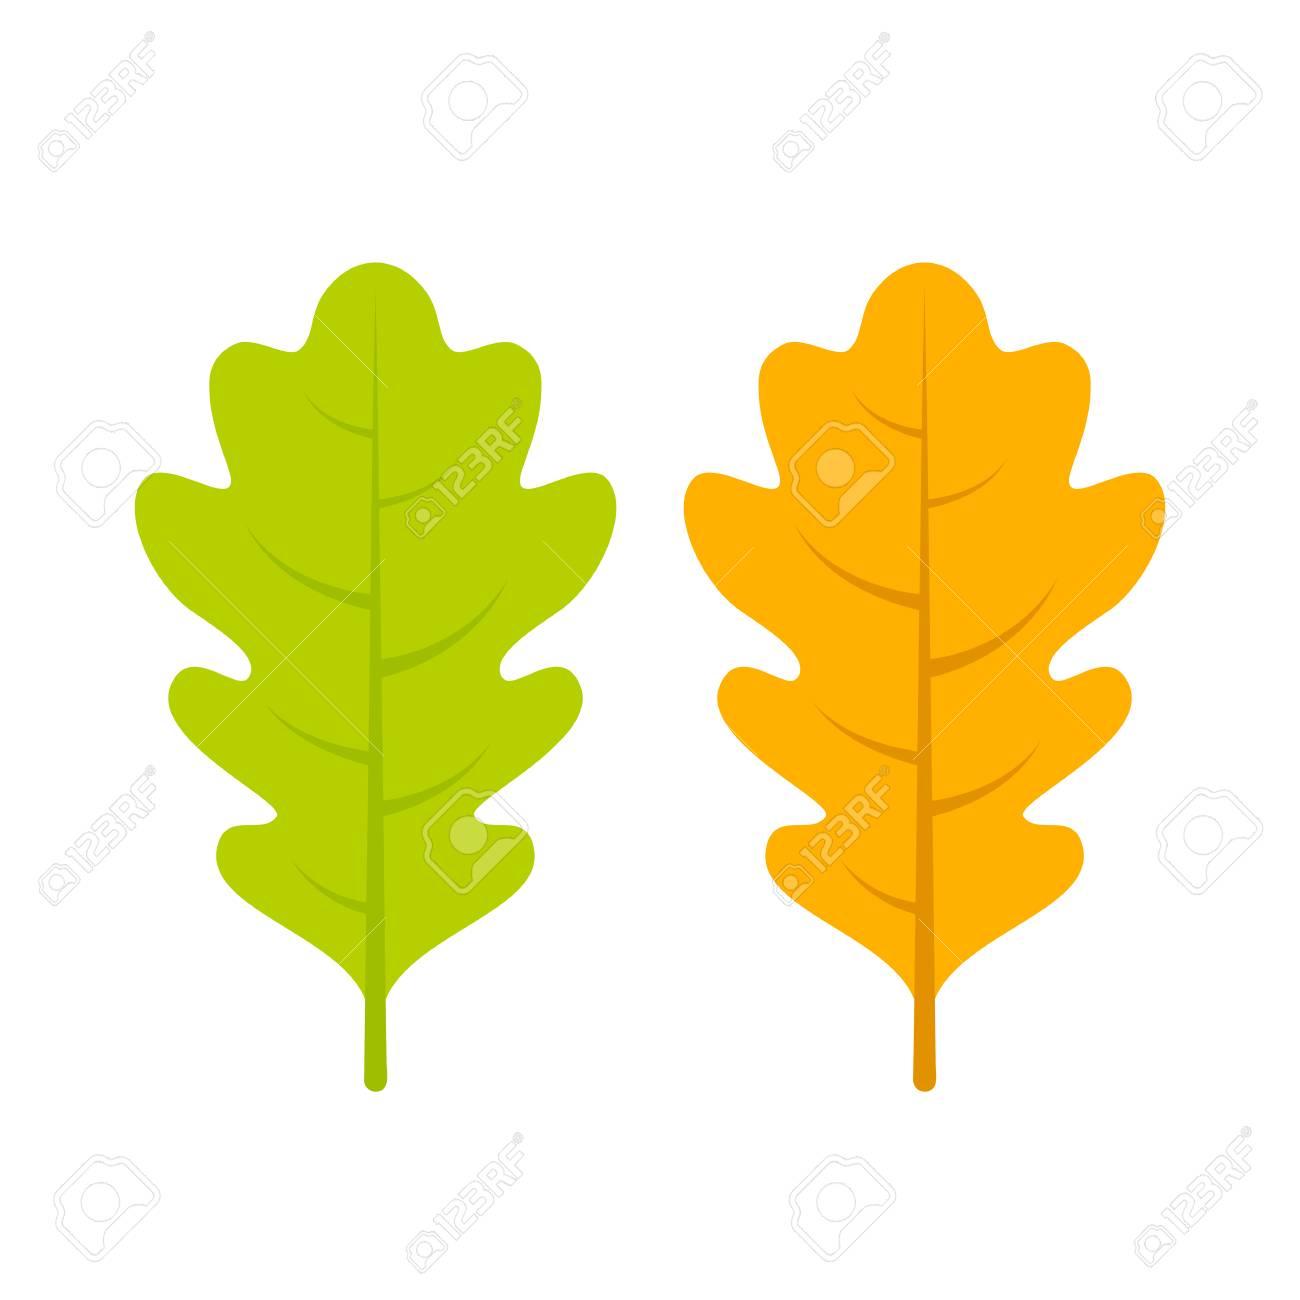 yellow and green oak leaf vector icon royalty free cliparts vectors rh 123rf com oak leaf wreath vector oak leaf wreath vector